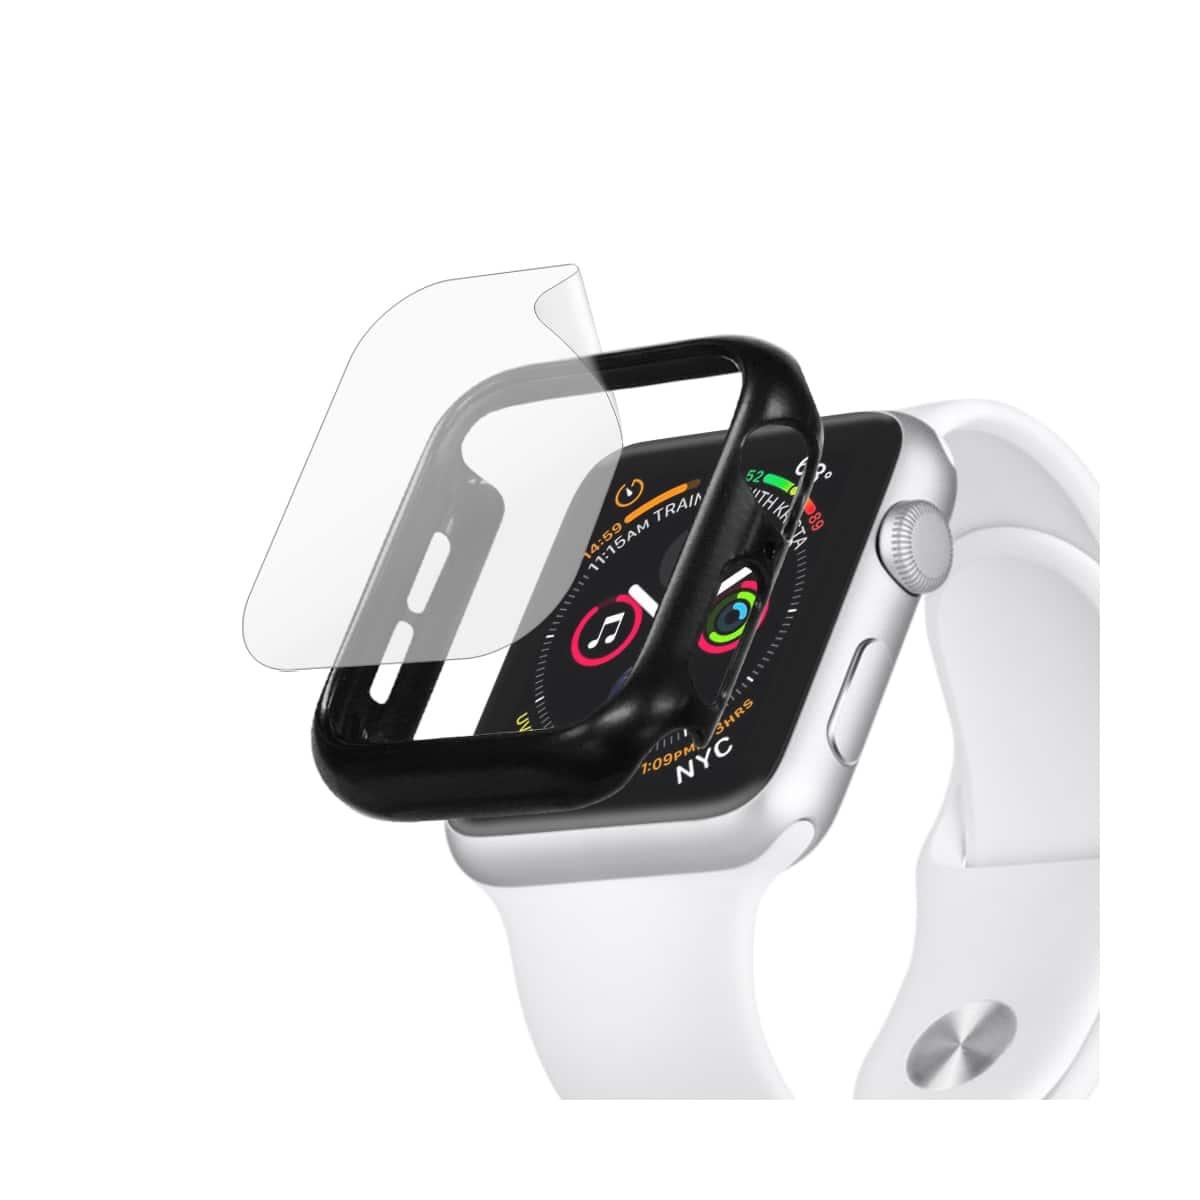 ECBB Apple Watch Series 6 / 5 / 4 / SE カバー & フィルム 40 mm 2020年 モデル 対応 21SU-I_photo_large